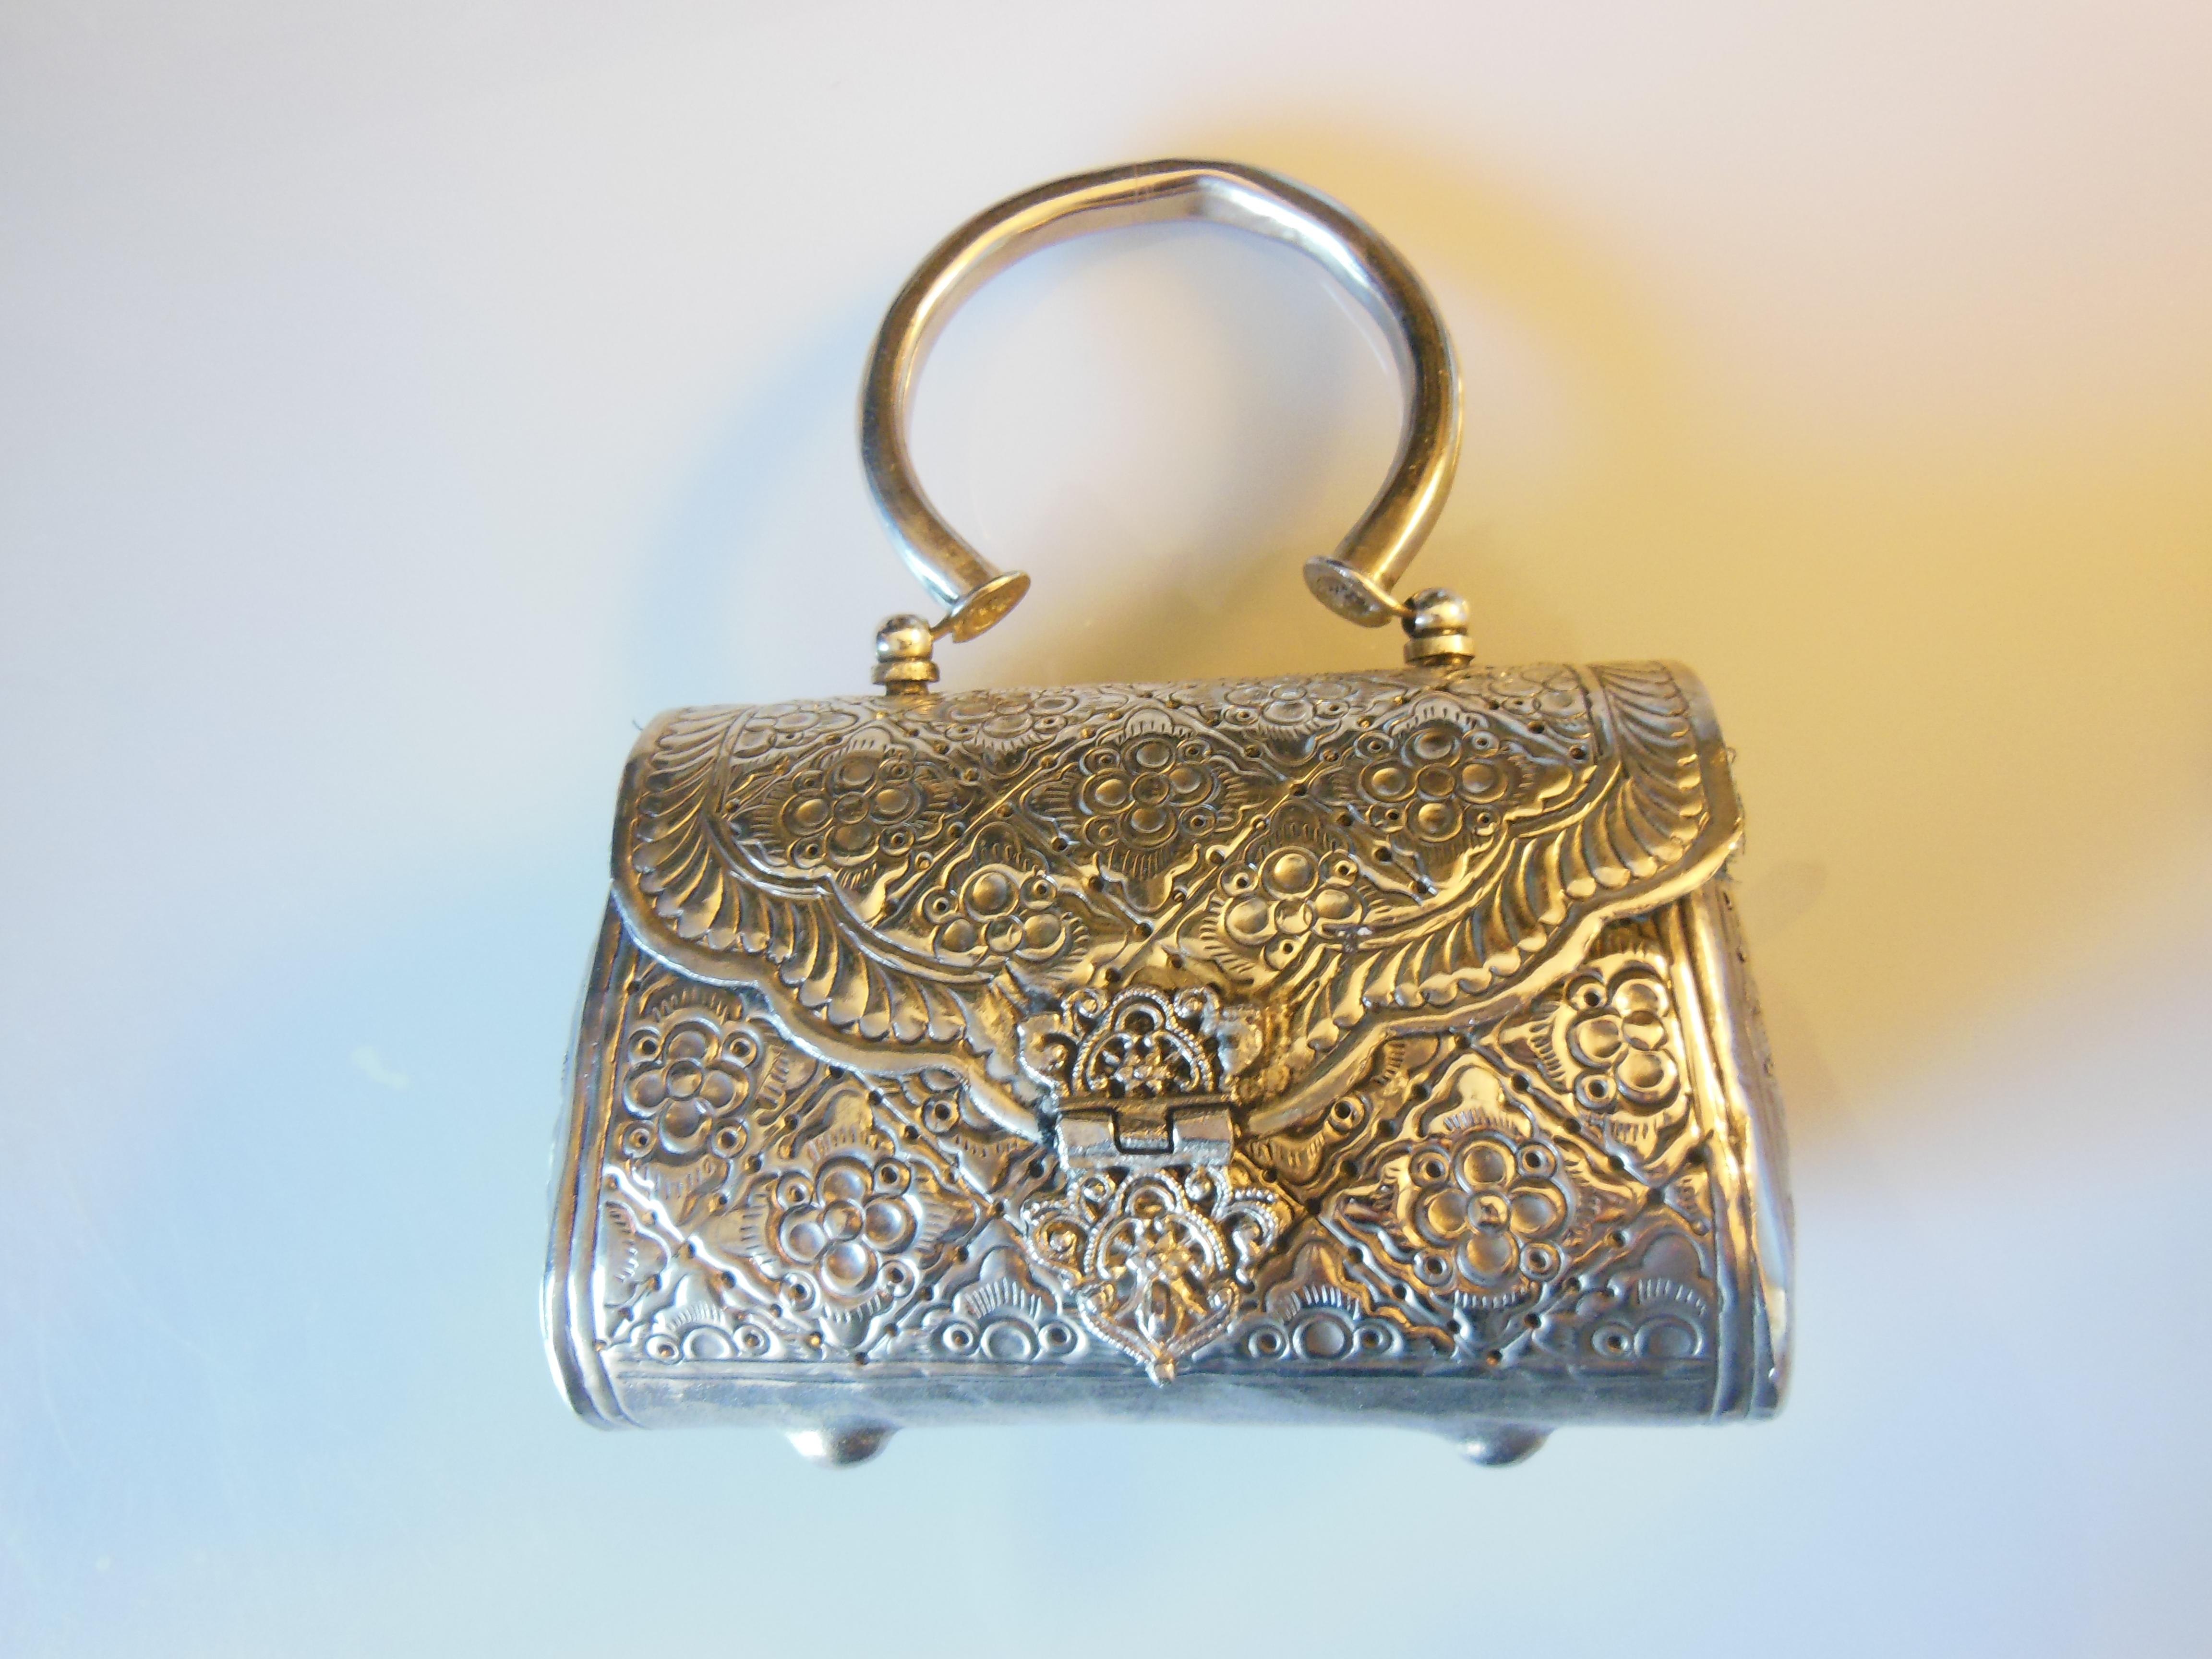 fashion-handbag-silver-metal-akaba-jordan.jpg